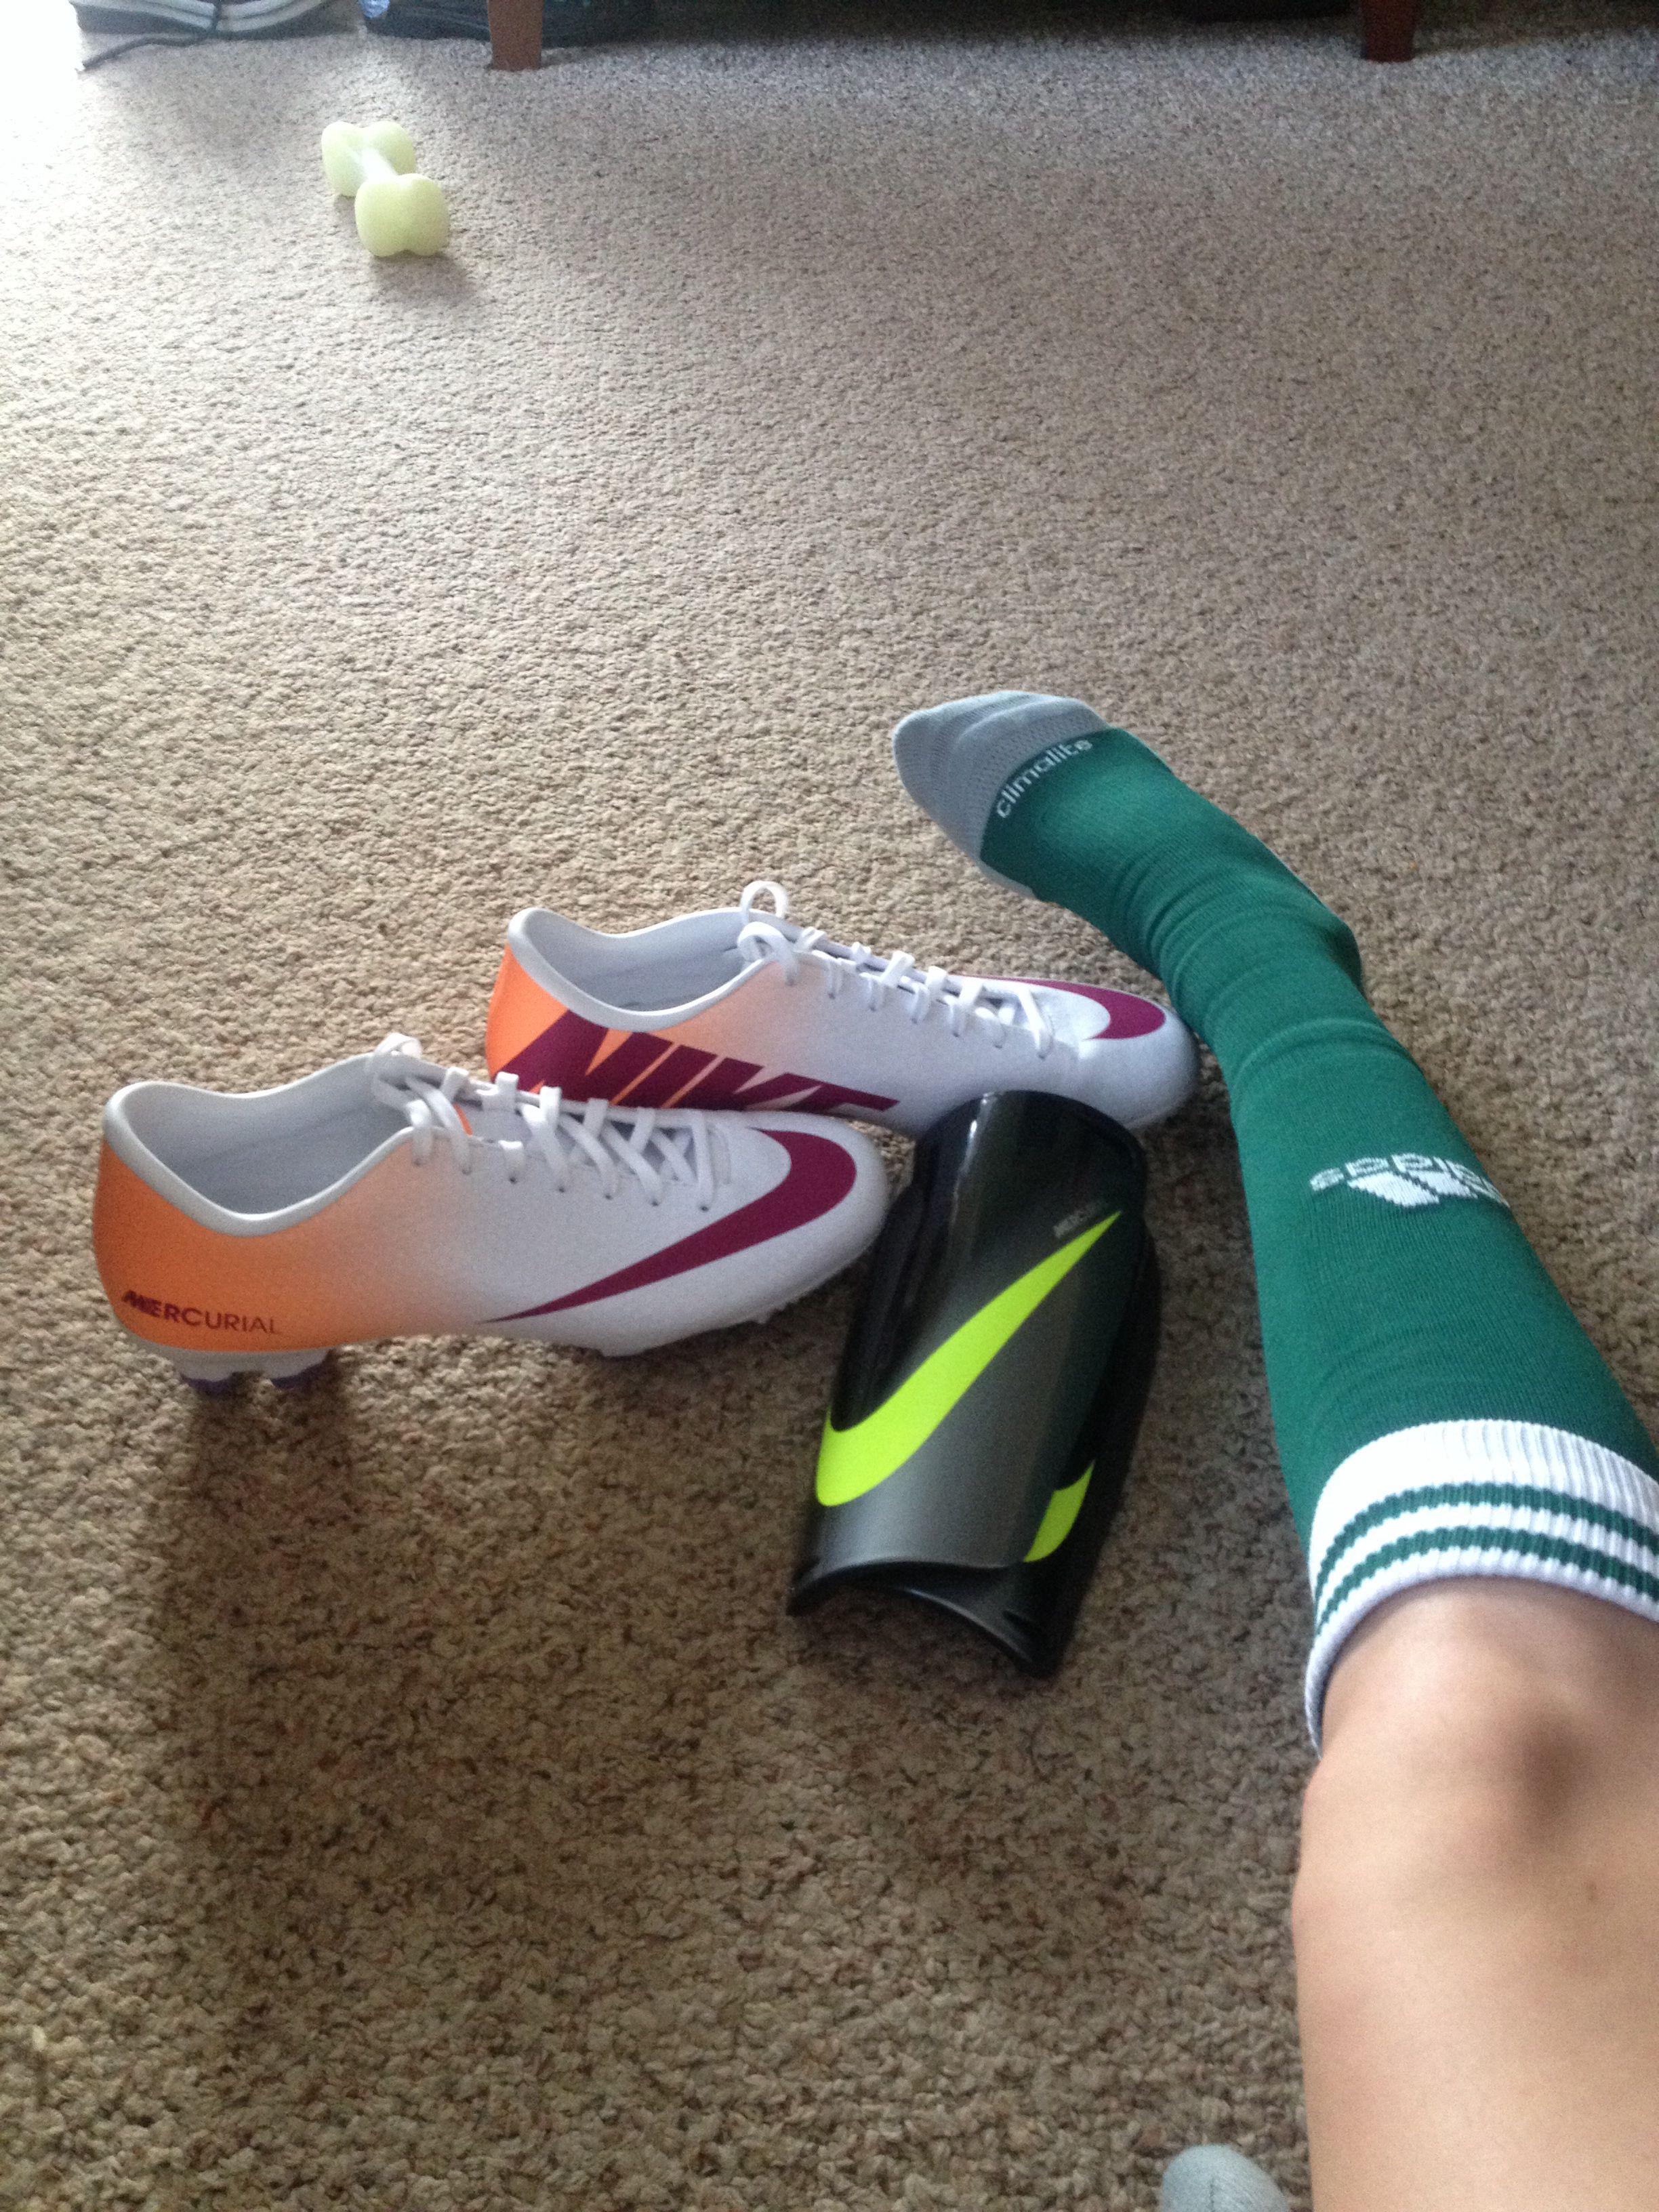 Awesome soccer gear. Nike mercurial cleats, nike shin guards, Adidas soccer  socks.